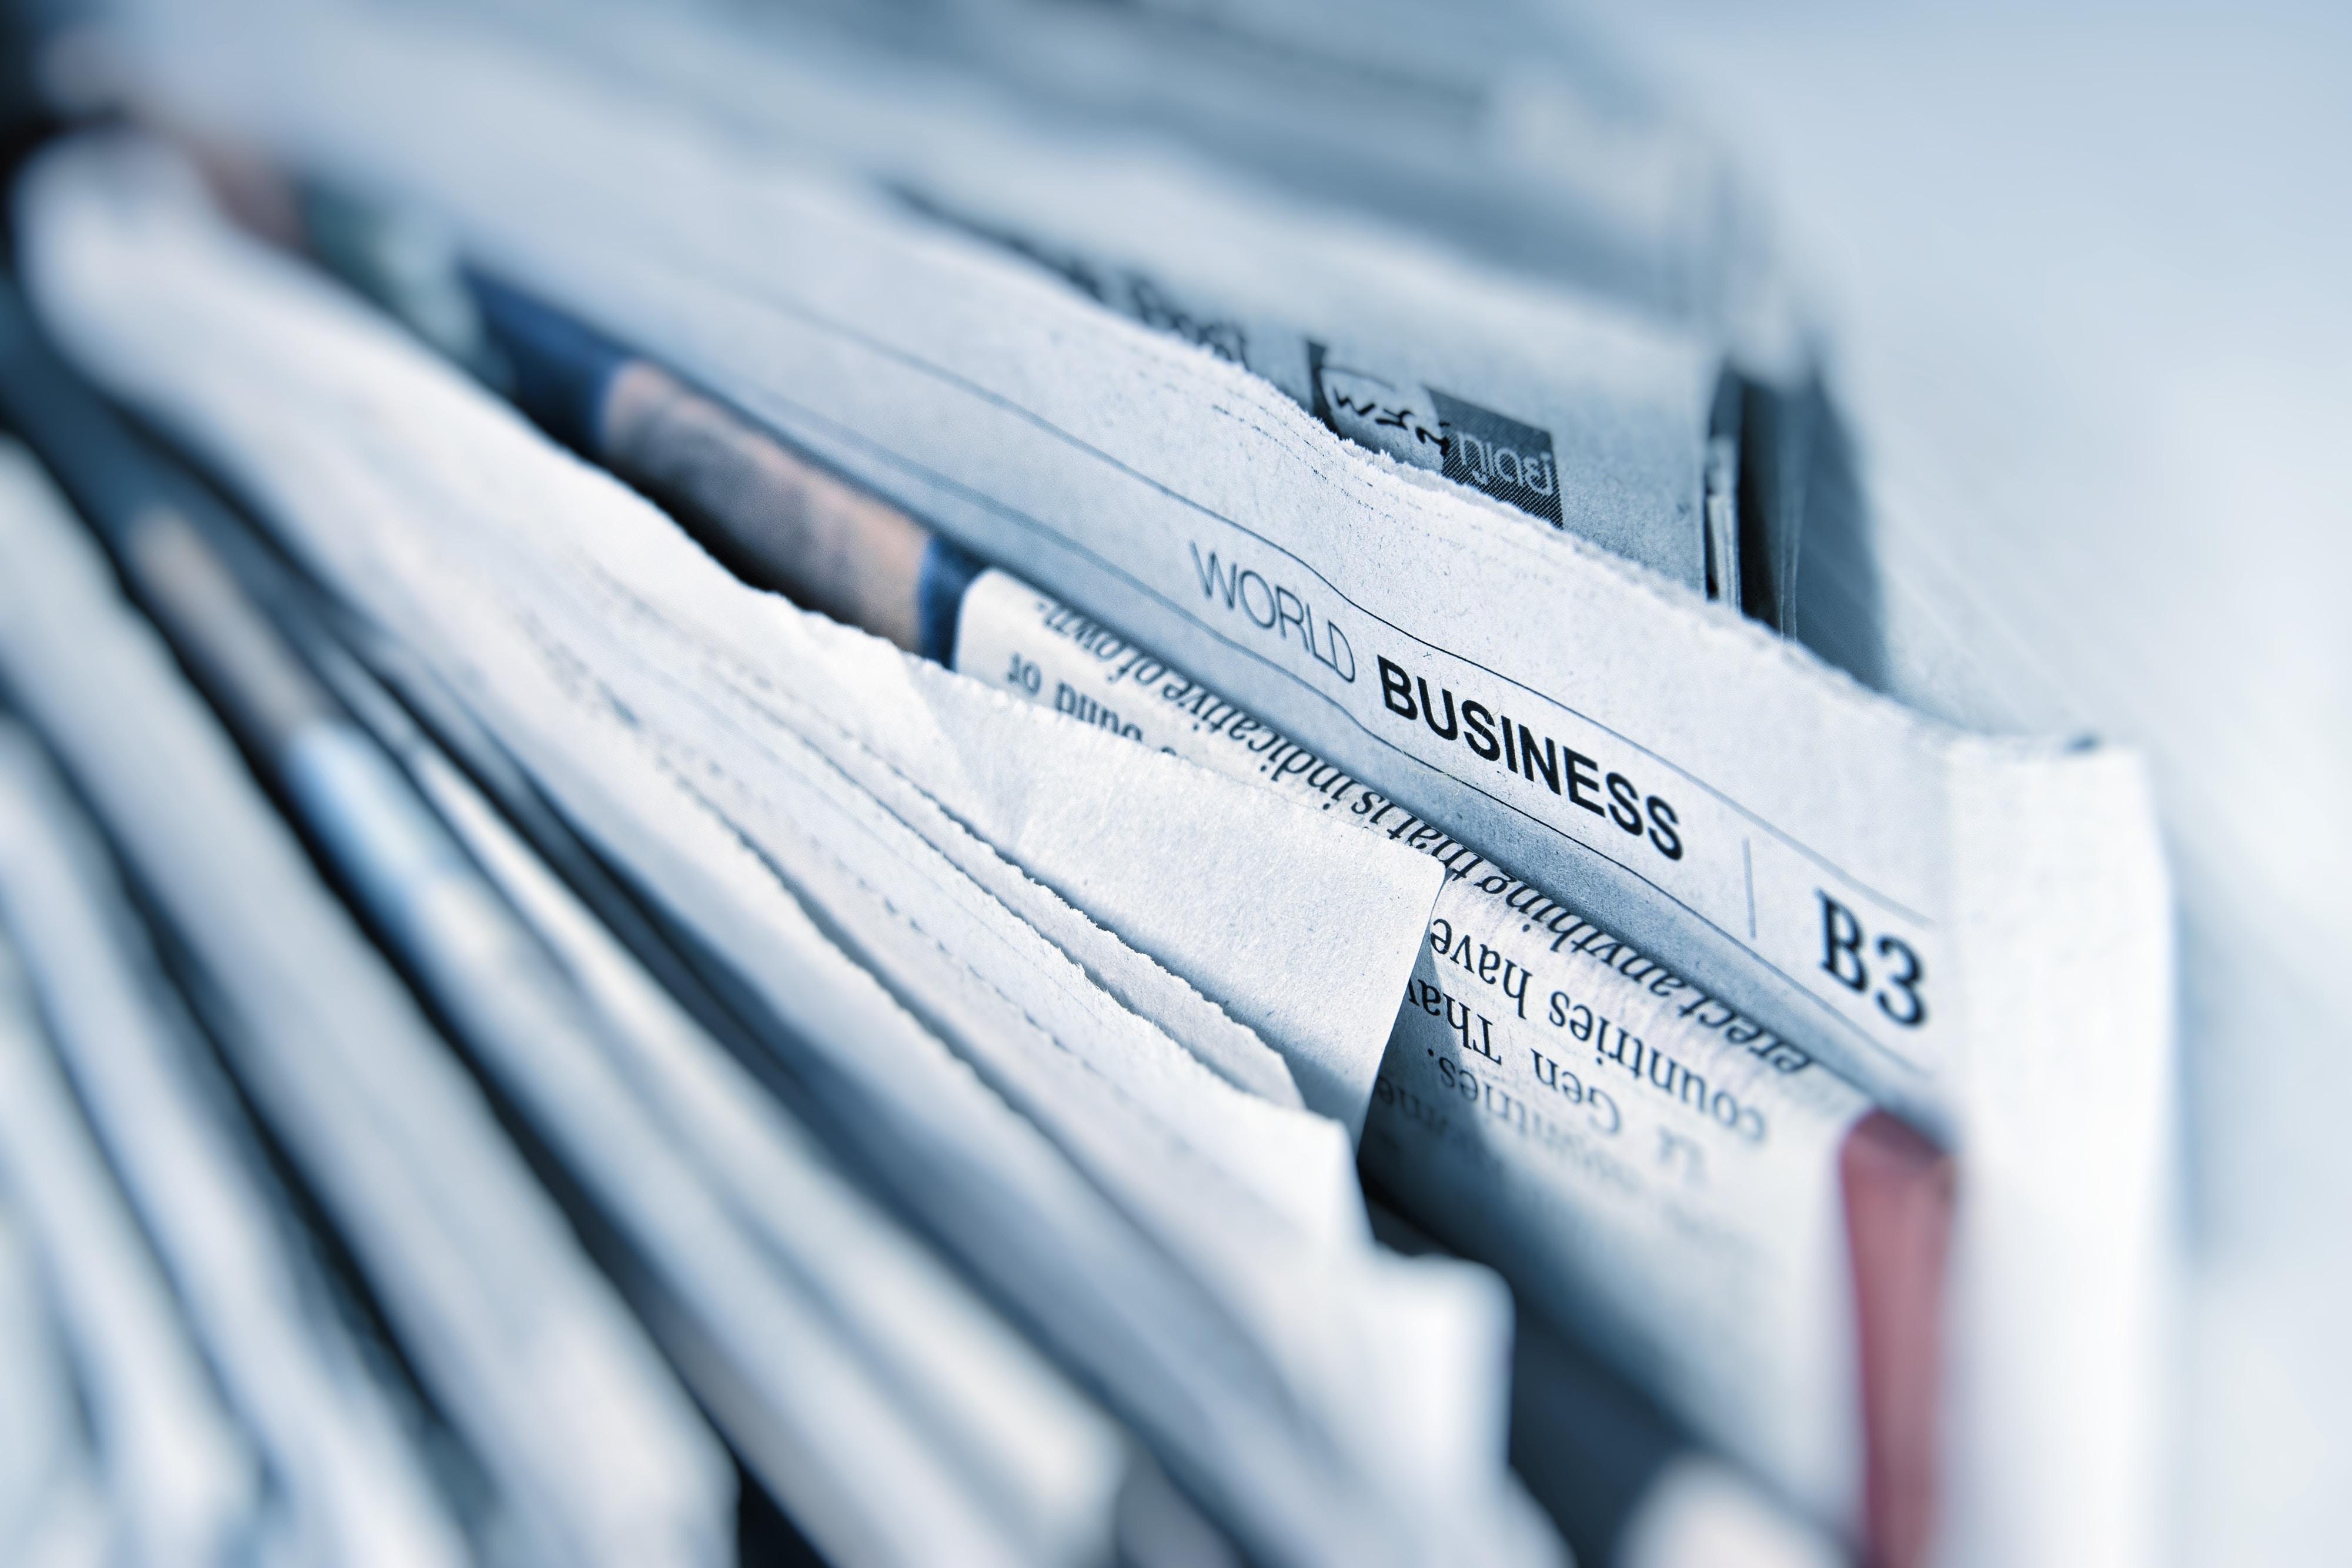 Weekly Sales Enablement News Roundup - June 14, 2019